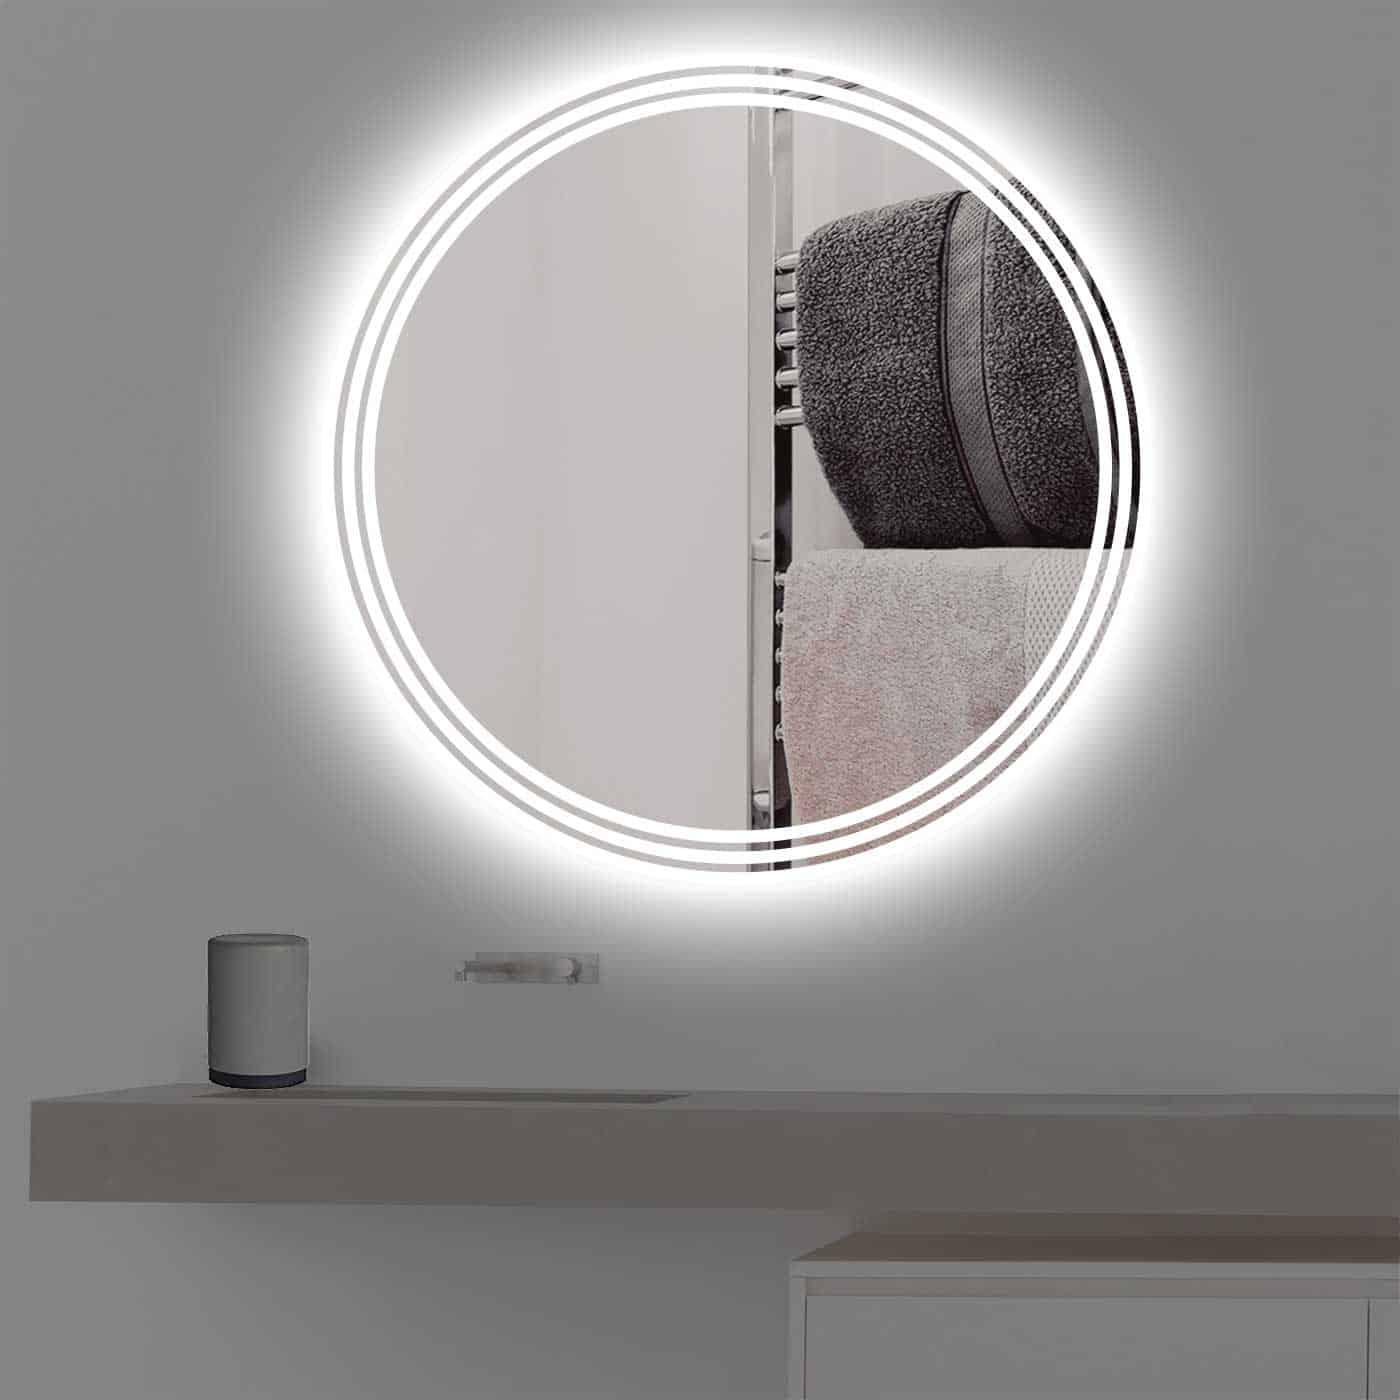 badspiegel beleuchtung good badezimmer aaacaccabad. Black Bedroom Furniture Sets. Home Design Ideas